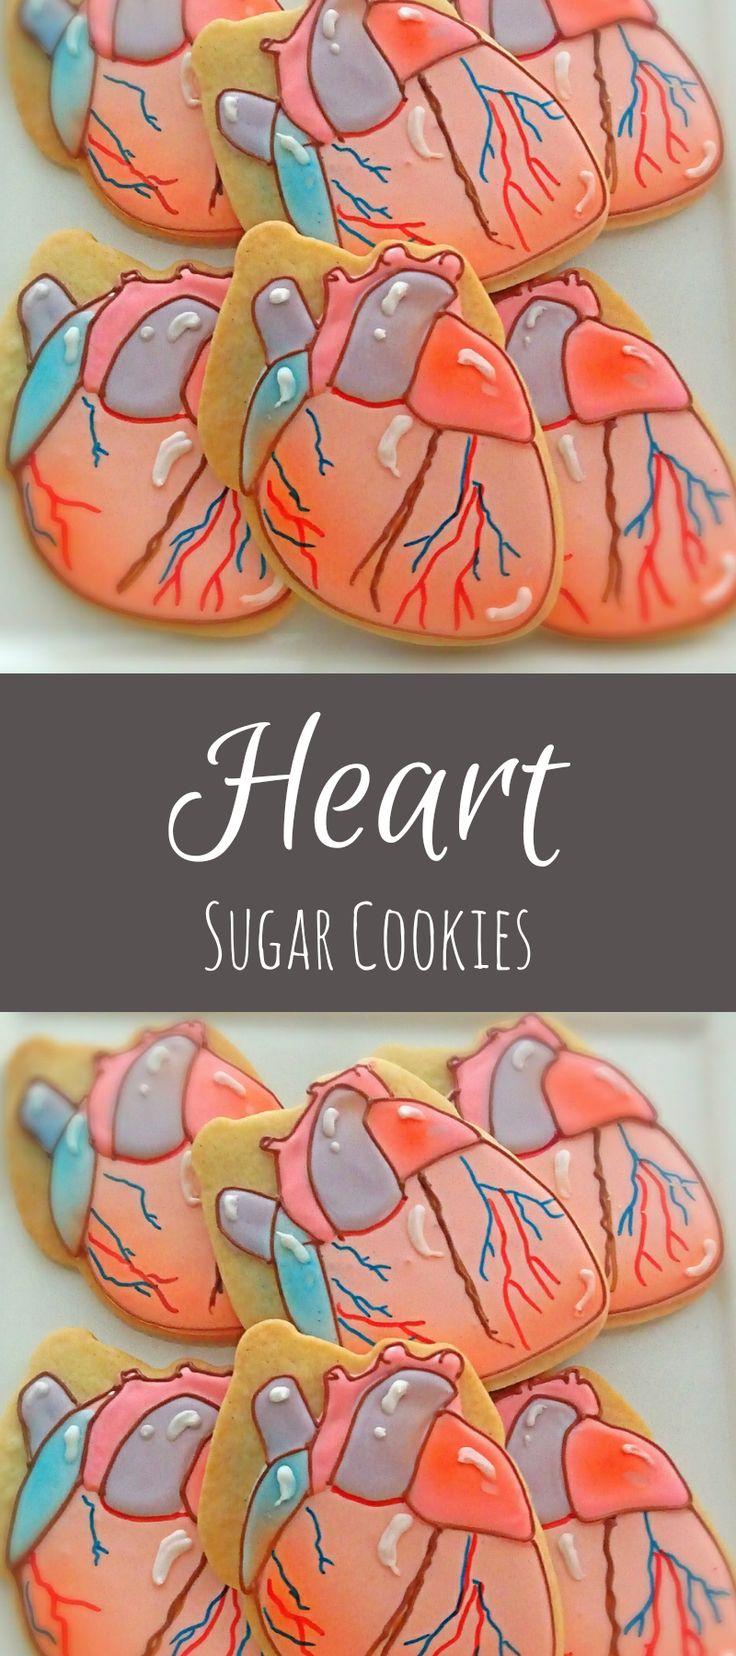 12 Anatomical Heart Shaped Sugar Cookies #affiliate